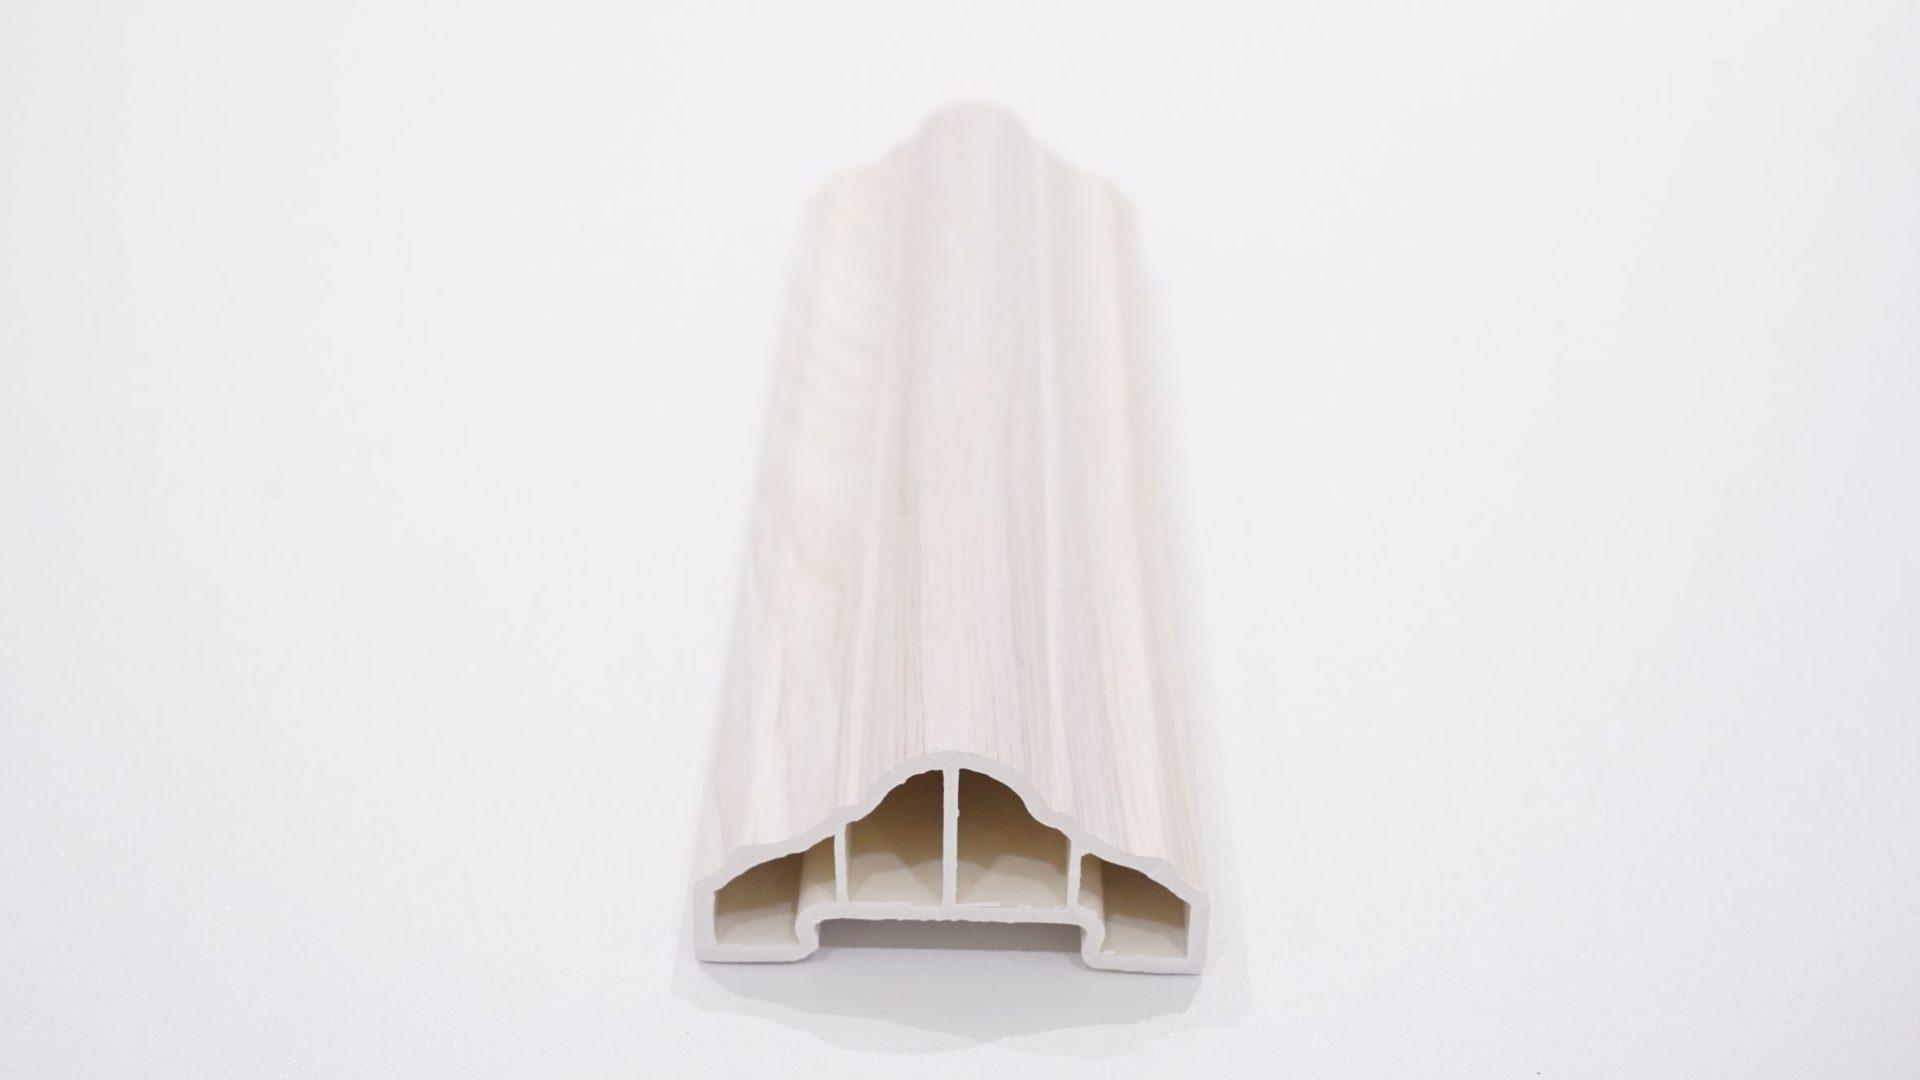 Phào cân 60 - AnPro decorative molding